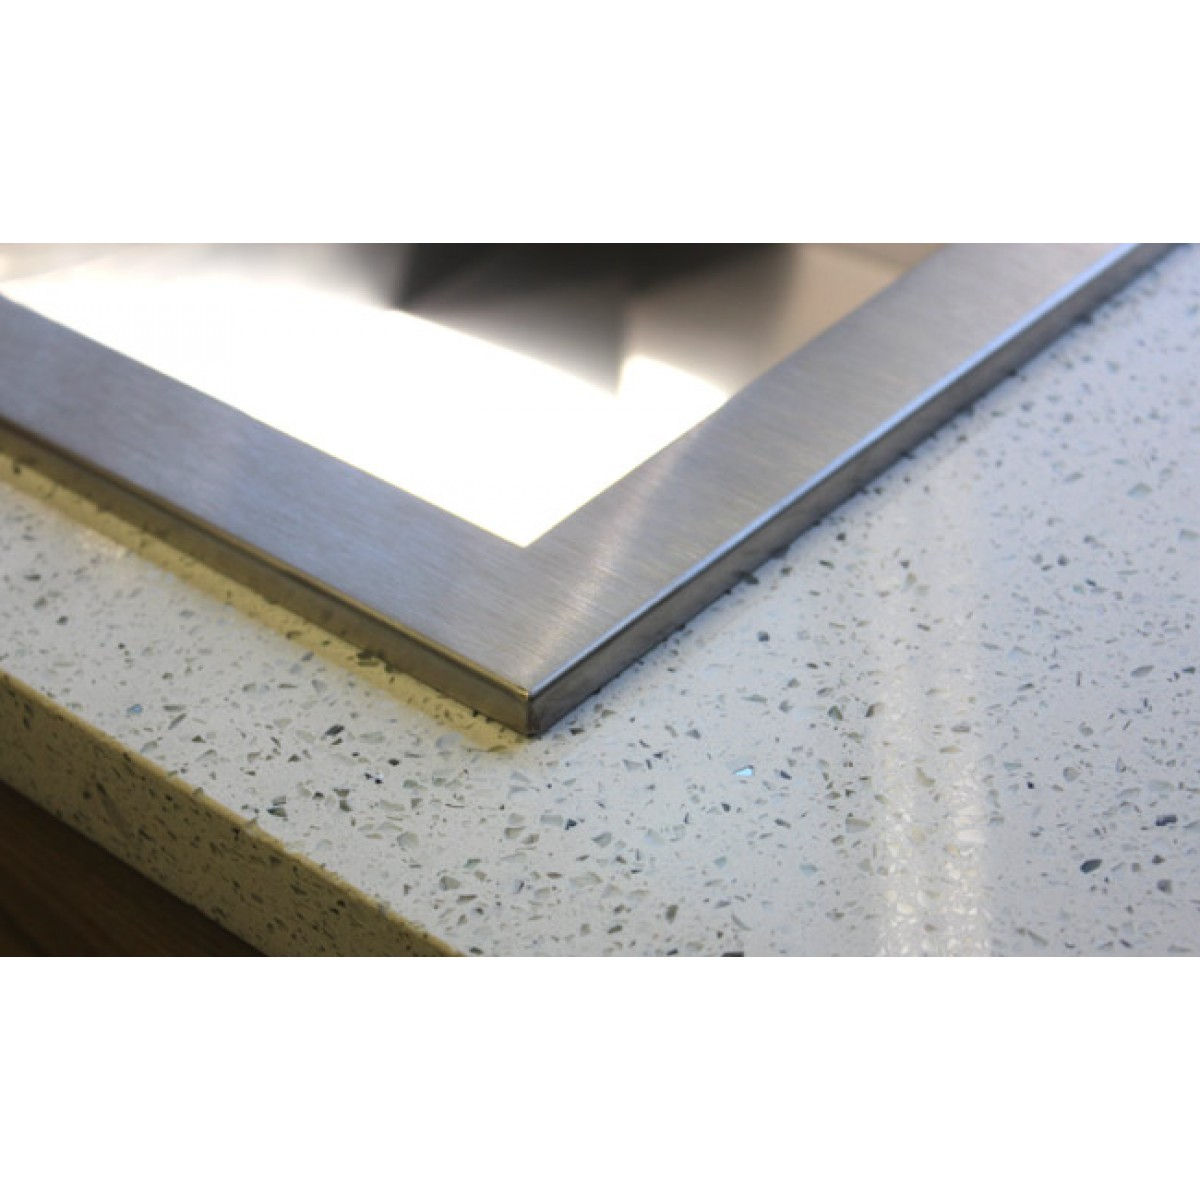 36 Inch Top-Mount / Drop-In Stainless Steel Single Bowl Kitchen Sink Zero  Radius Design